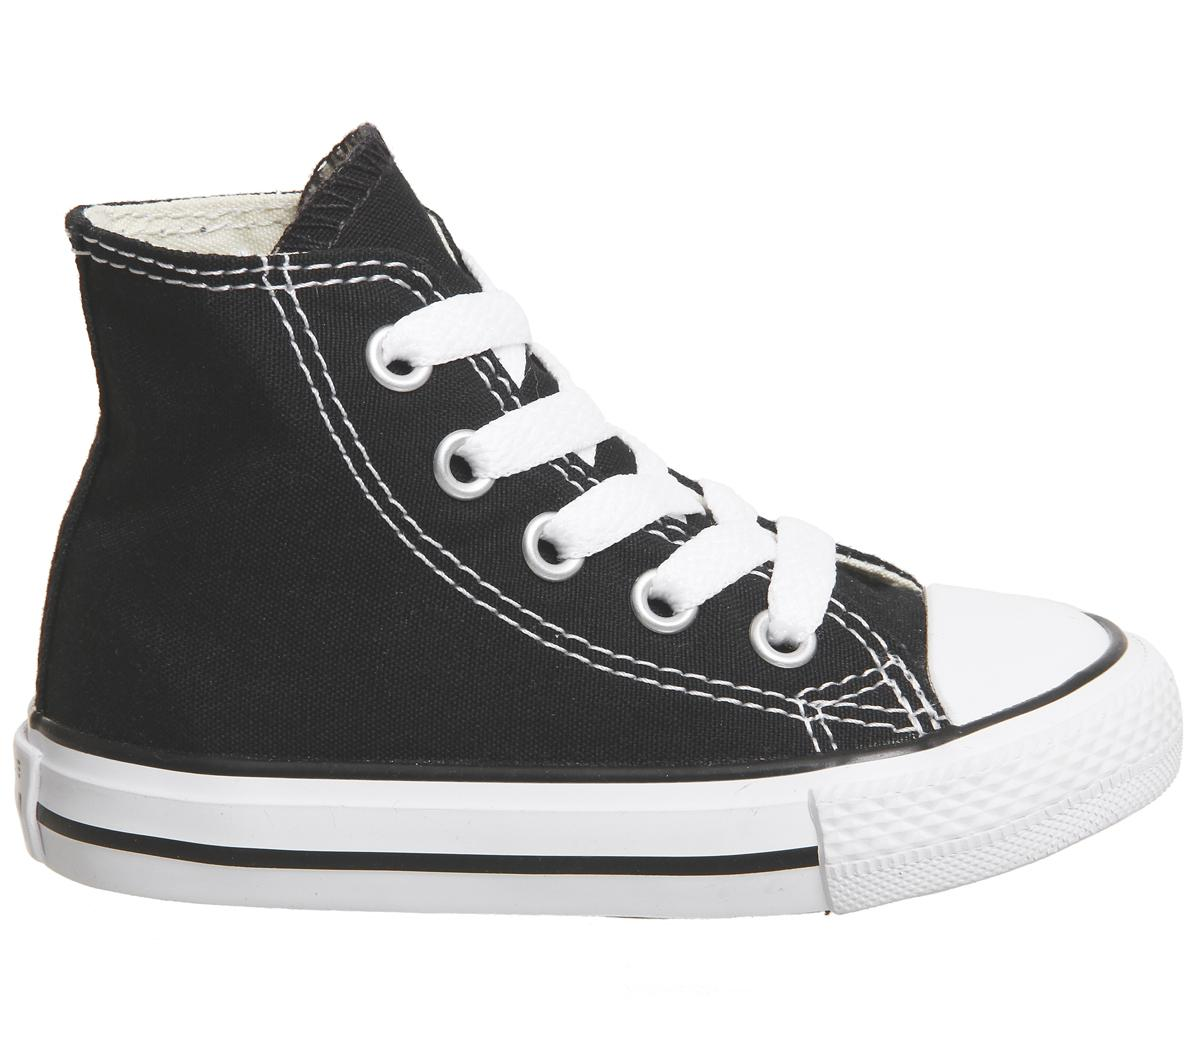 92436ea0227b Lyst - Converse Small Star Hi Canvas in Black for Men